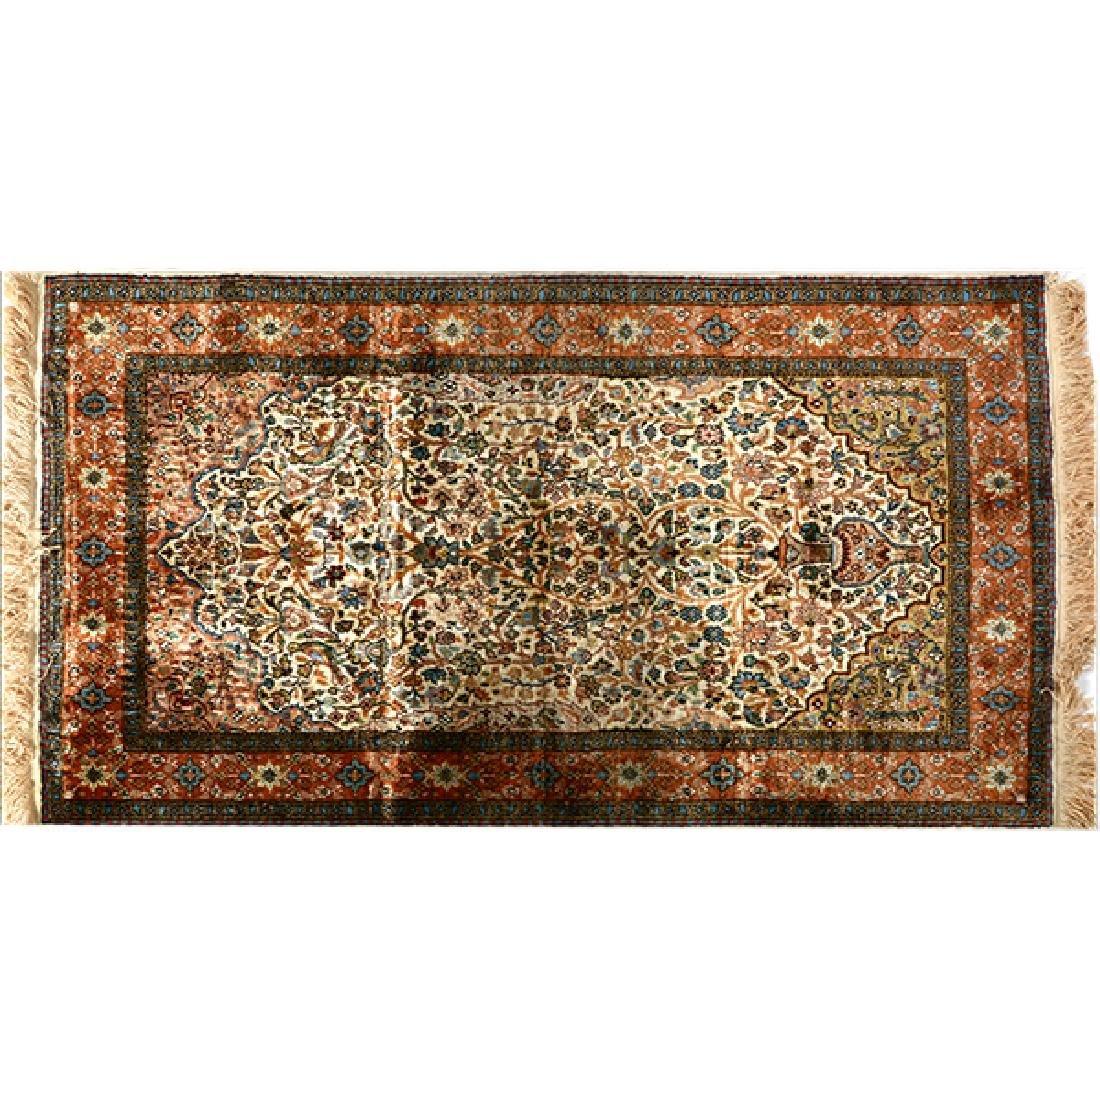 Egyptian Silk Prayer Rug: 2 feet 6 inches x 4 feet 3